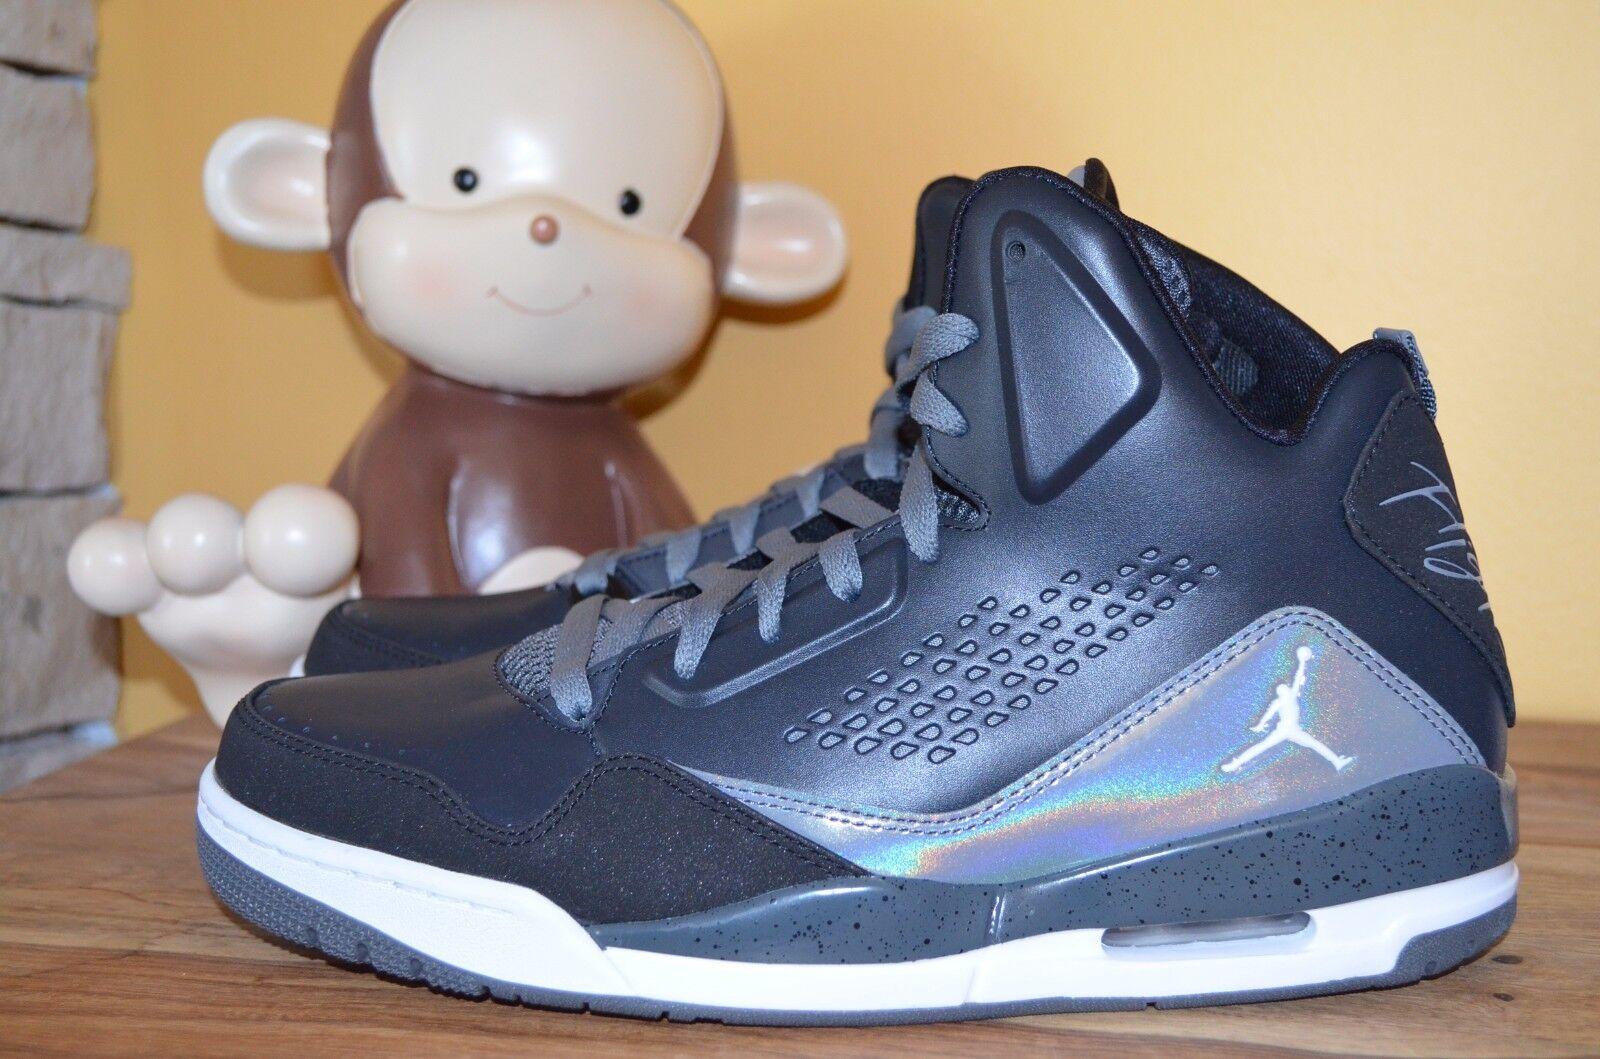 Nuevo JORDAN SC-3 Baloncesto Zapato Negro gris Frío blancoo 453640-002